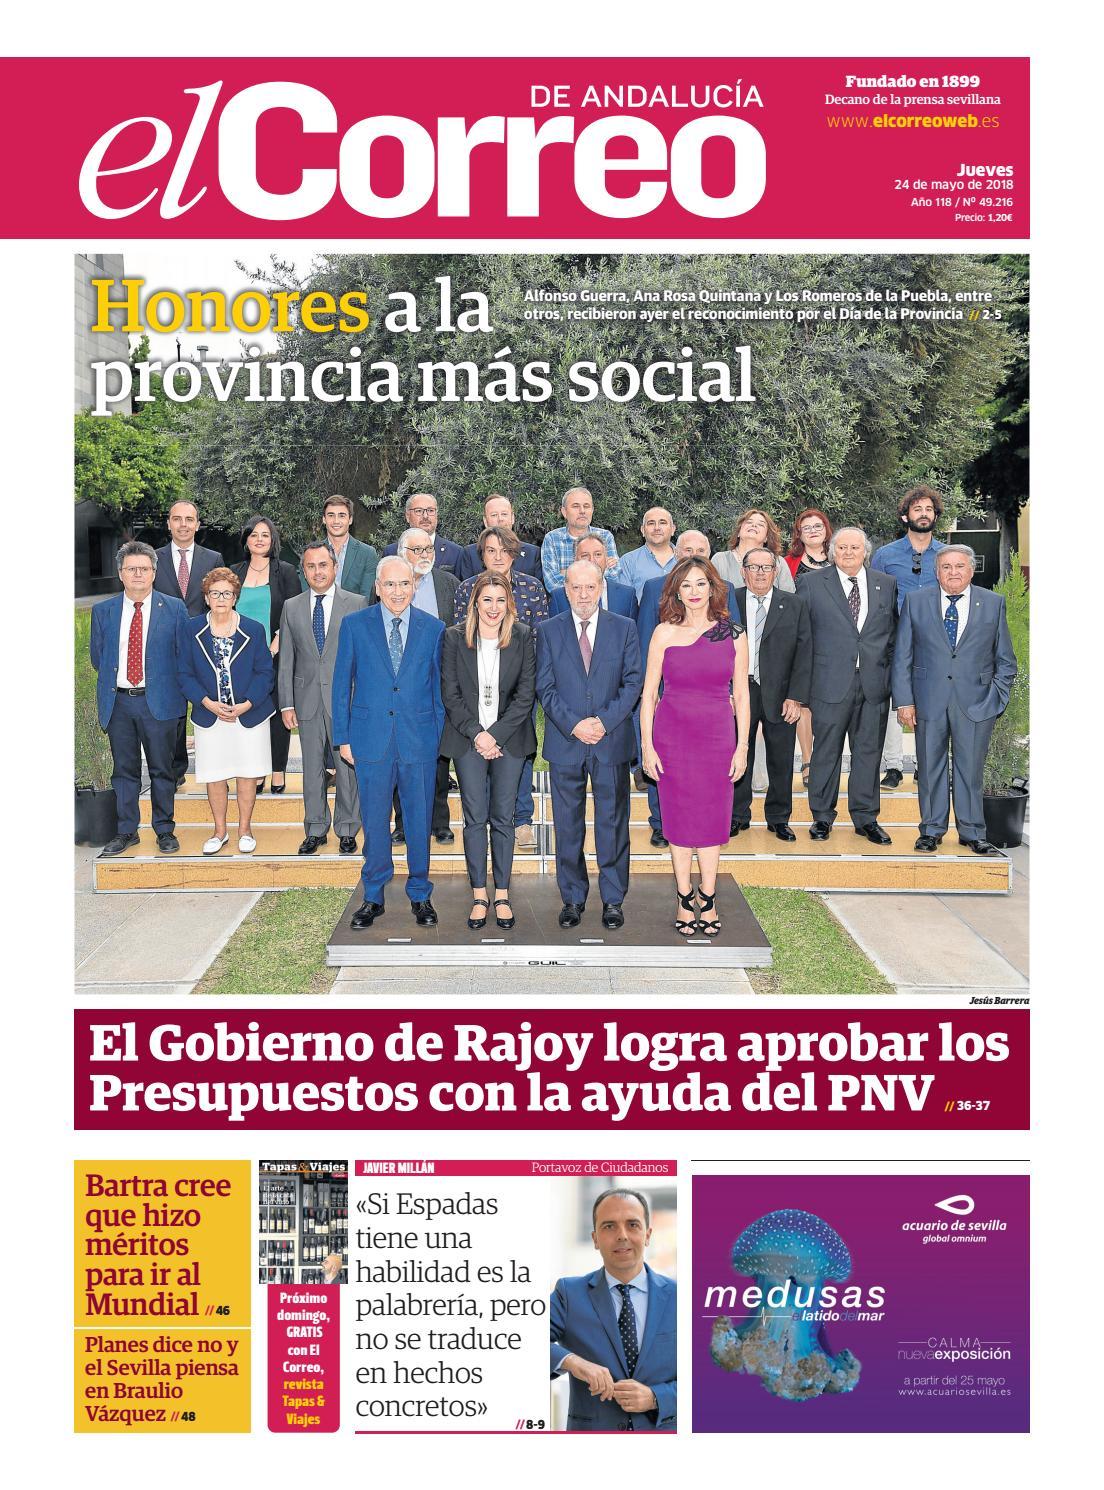 b5545645082e 24.05.2018 El Correo de Andalucía by EL CORREO DE ANDALUCÍA S.L. - issuu